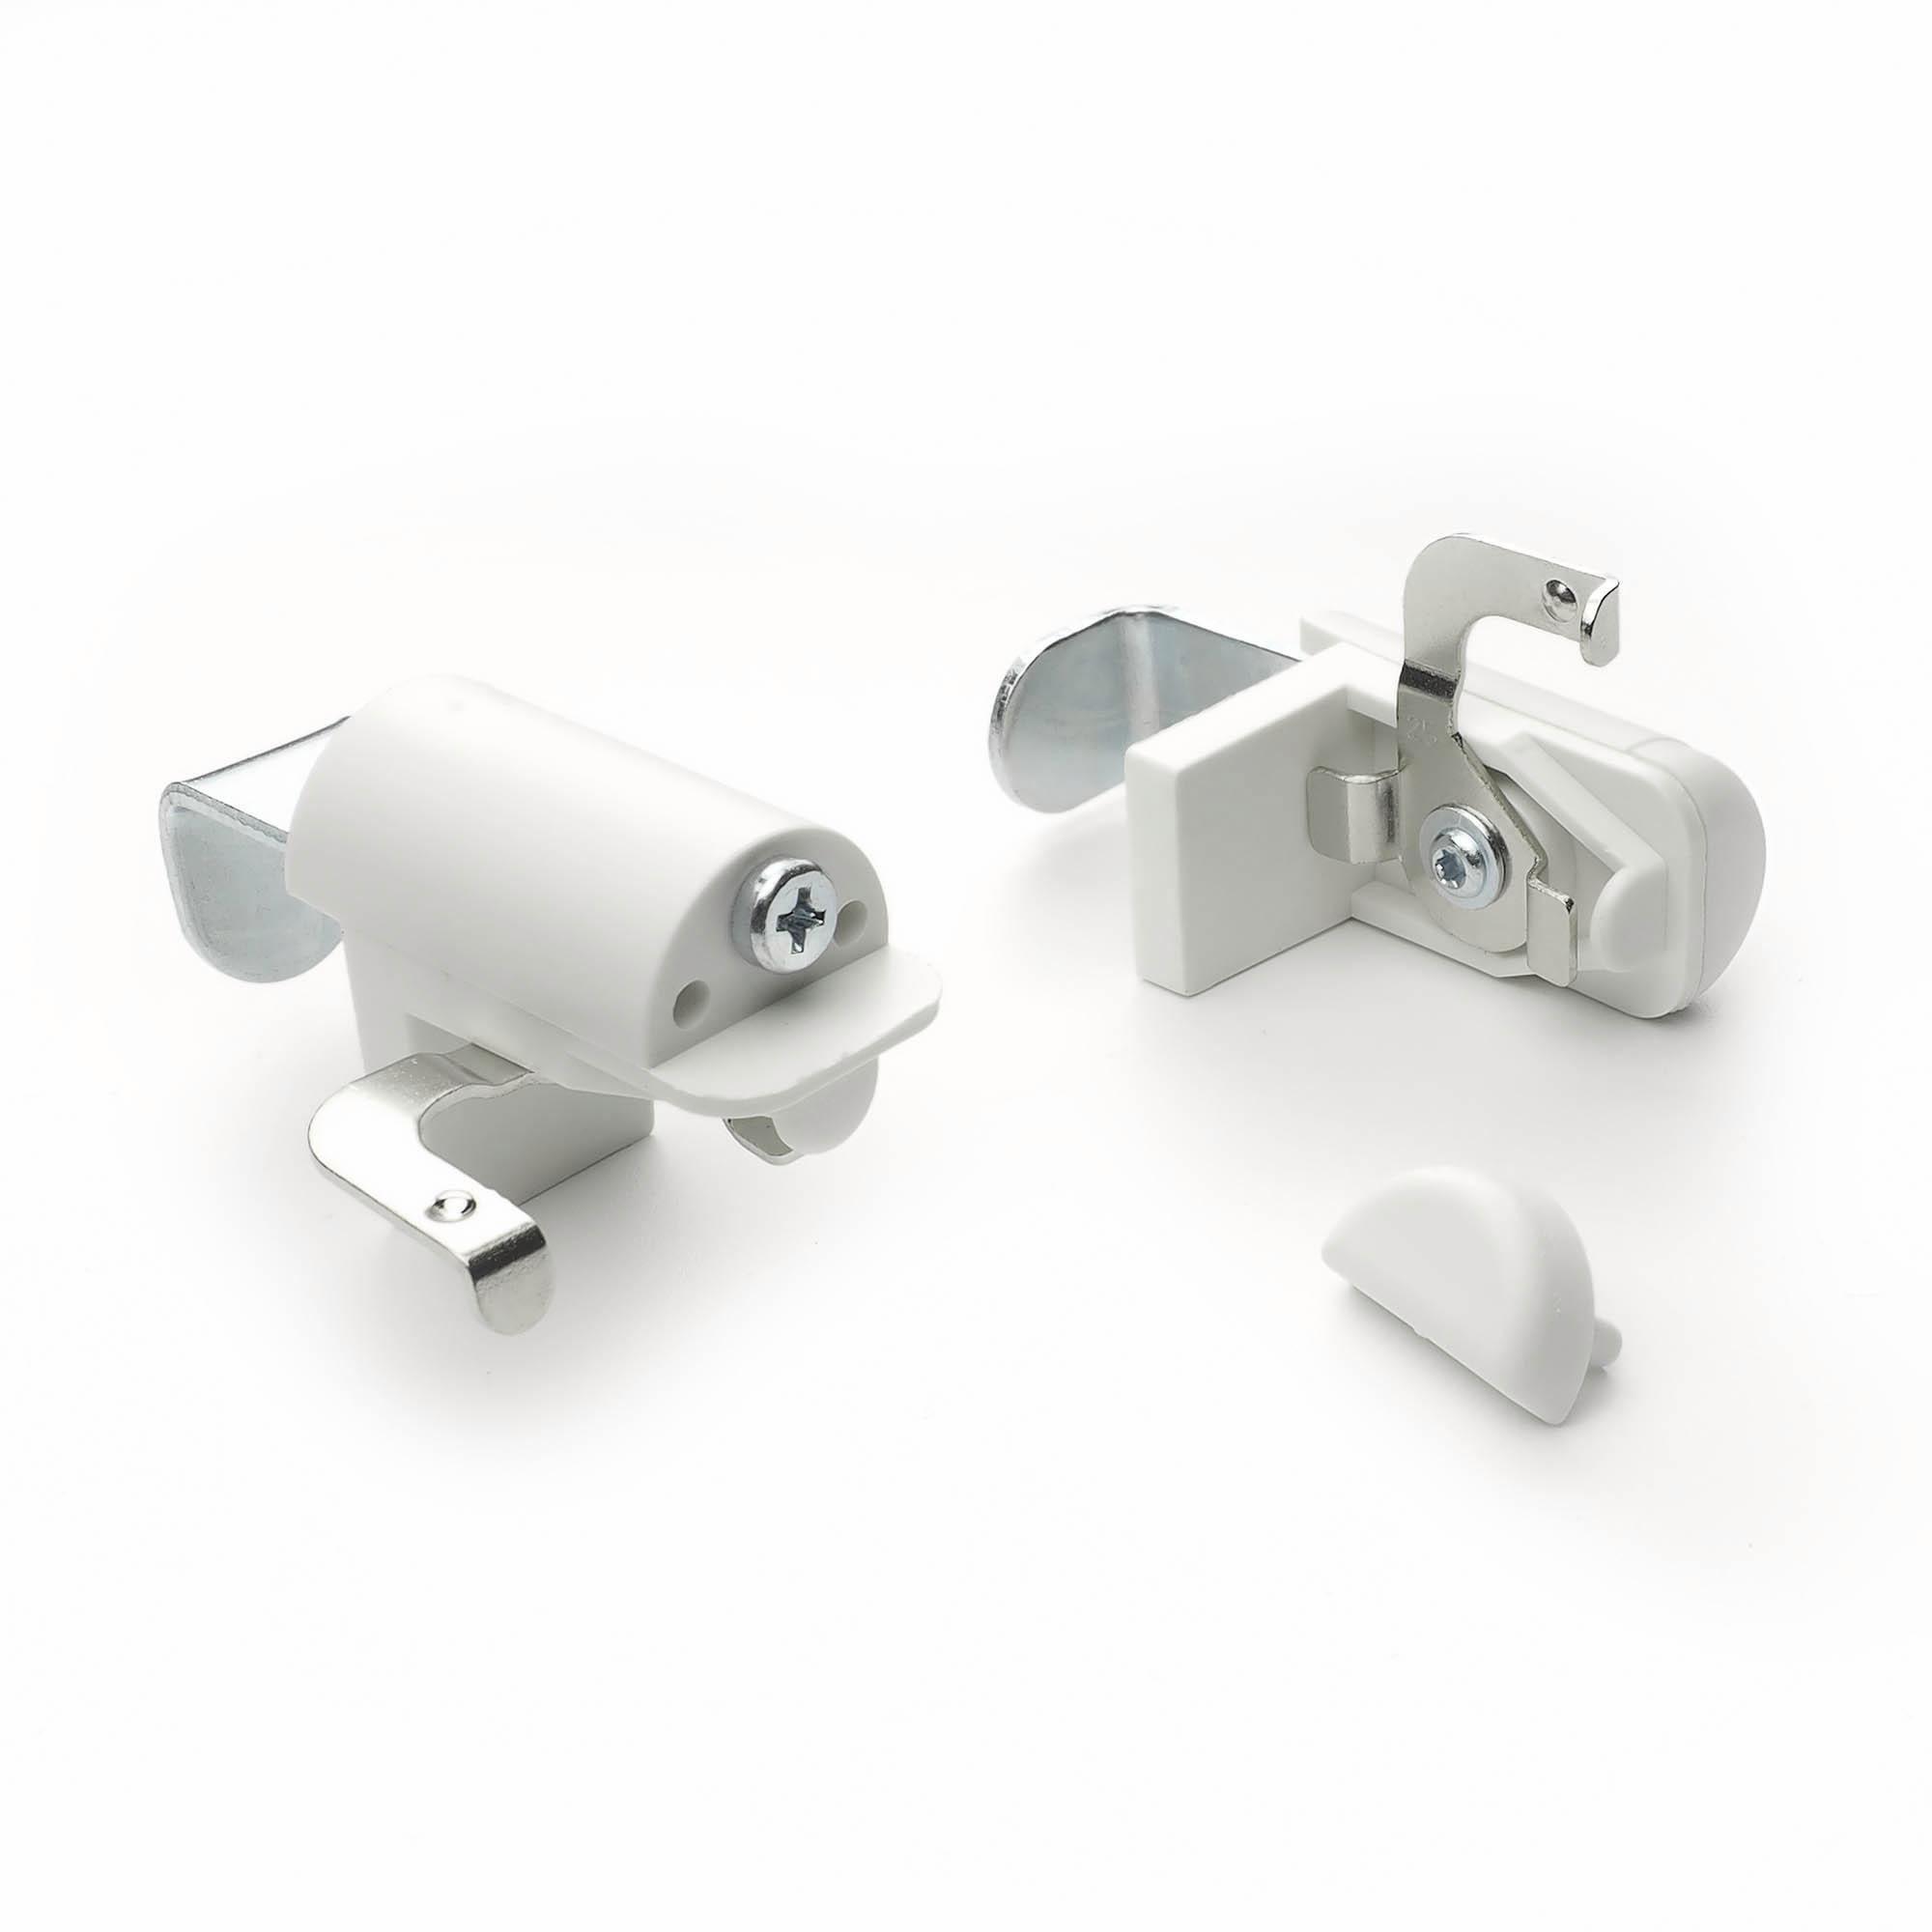 Klemmträger, Liedeco, Jalousien, (Set, 2-tlg), Blindfix für Aluminium-Jalousien